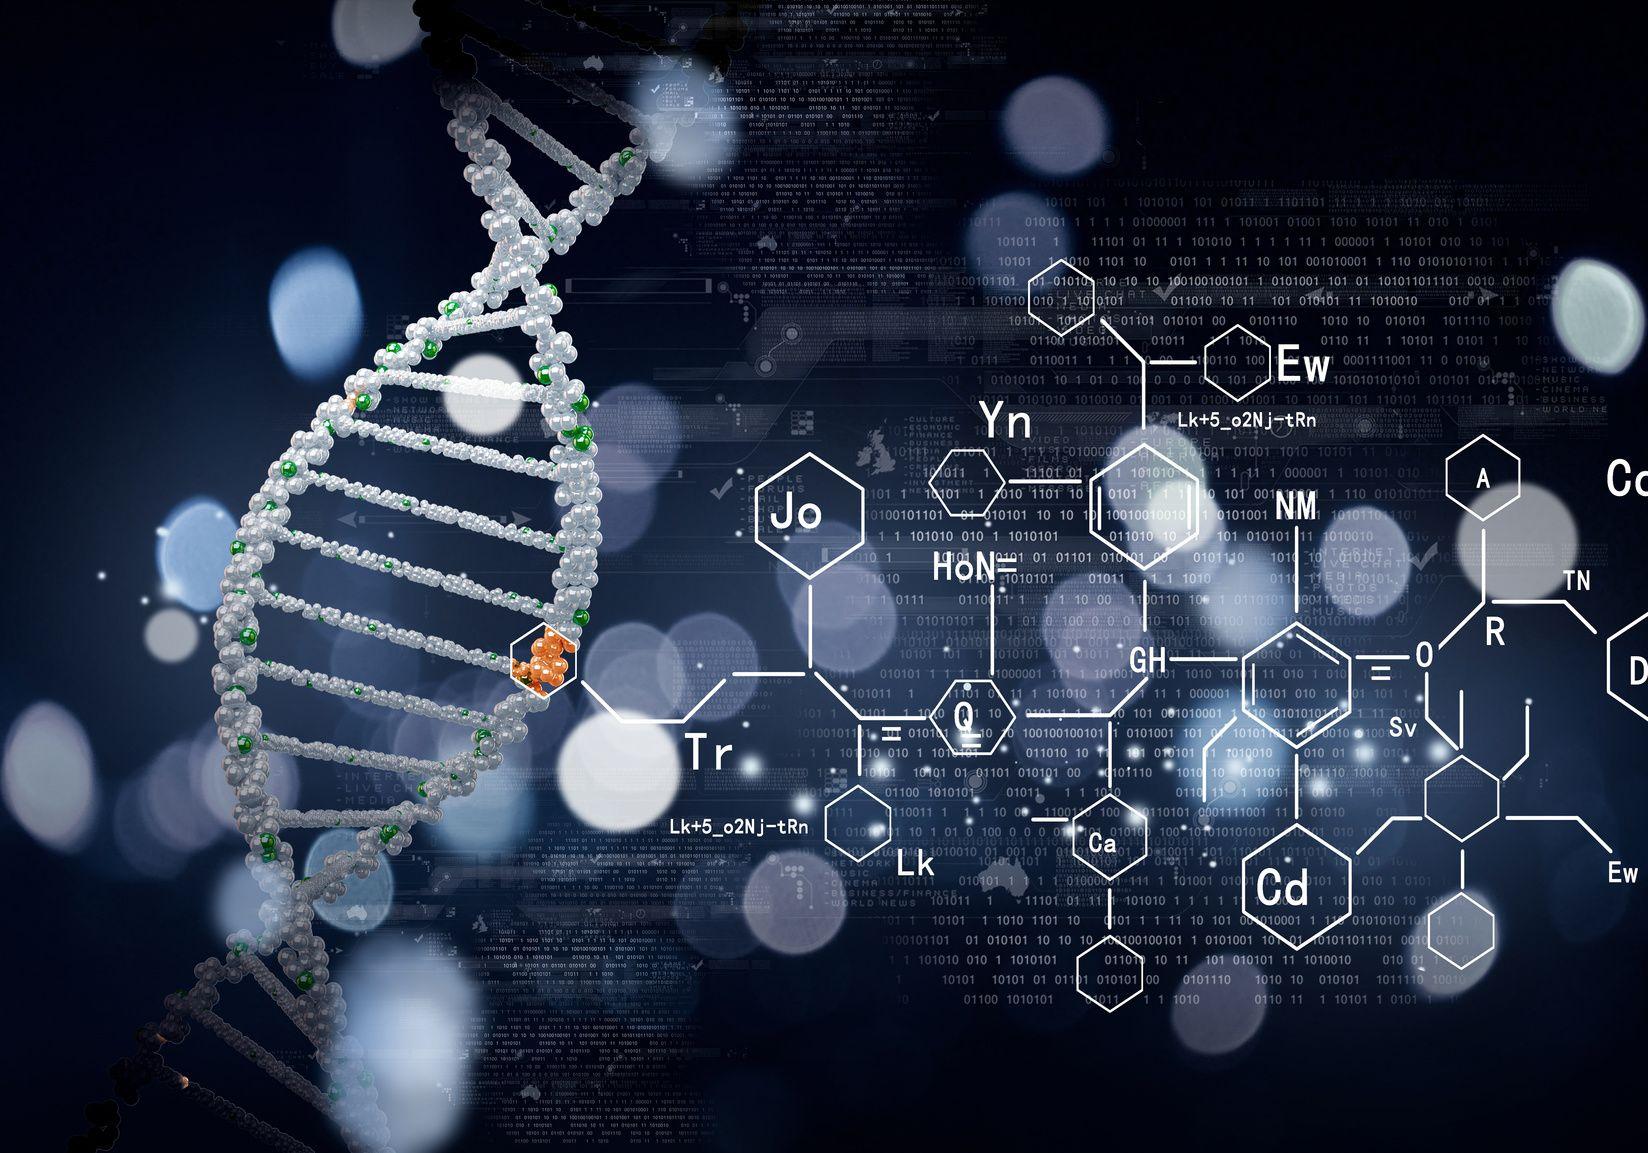 Biological Graphic Design